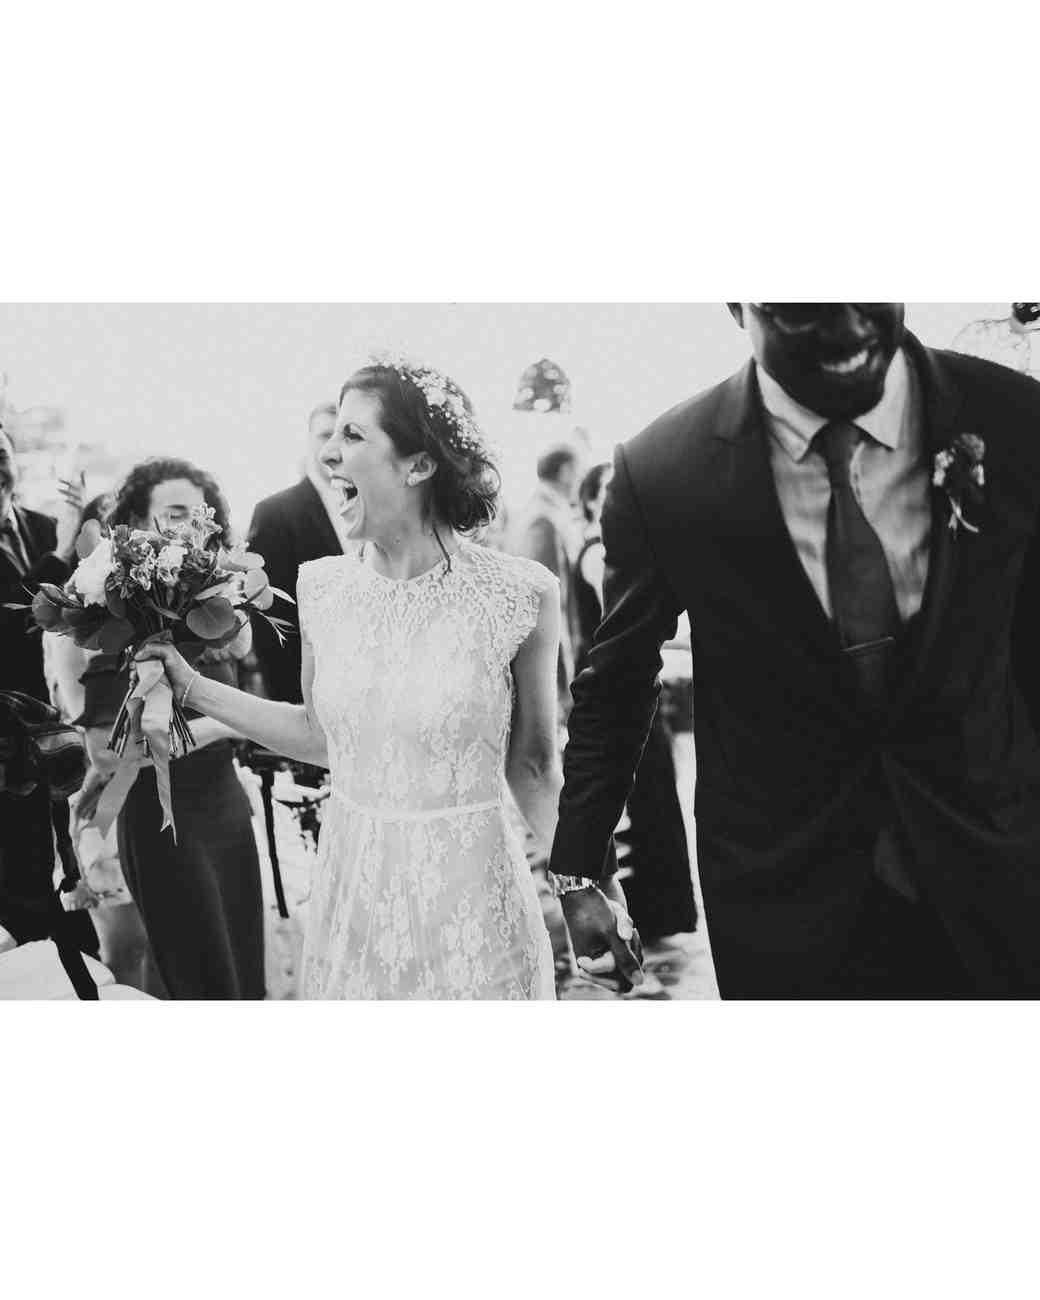 rebecca-eji-wedding-recessional-424-s113057-0616.jpg